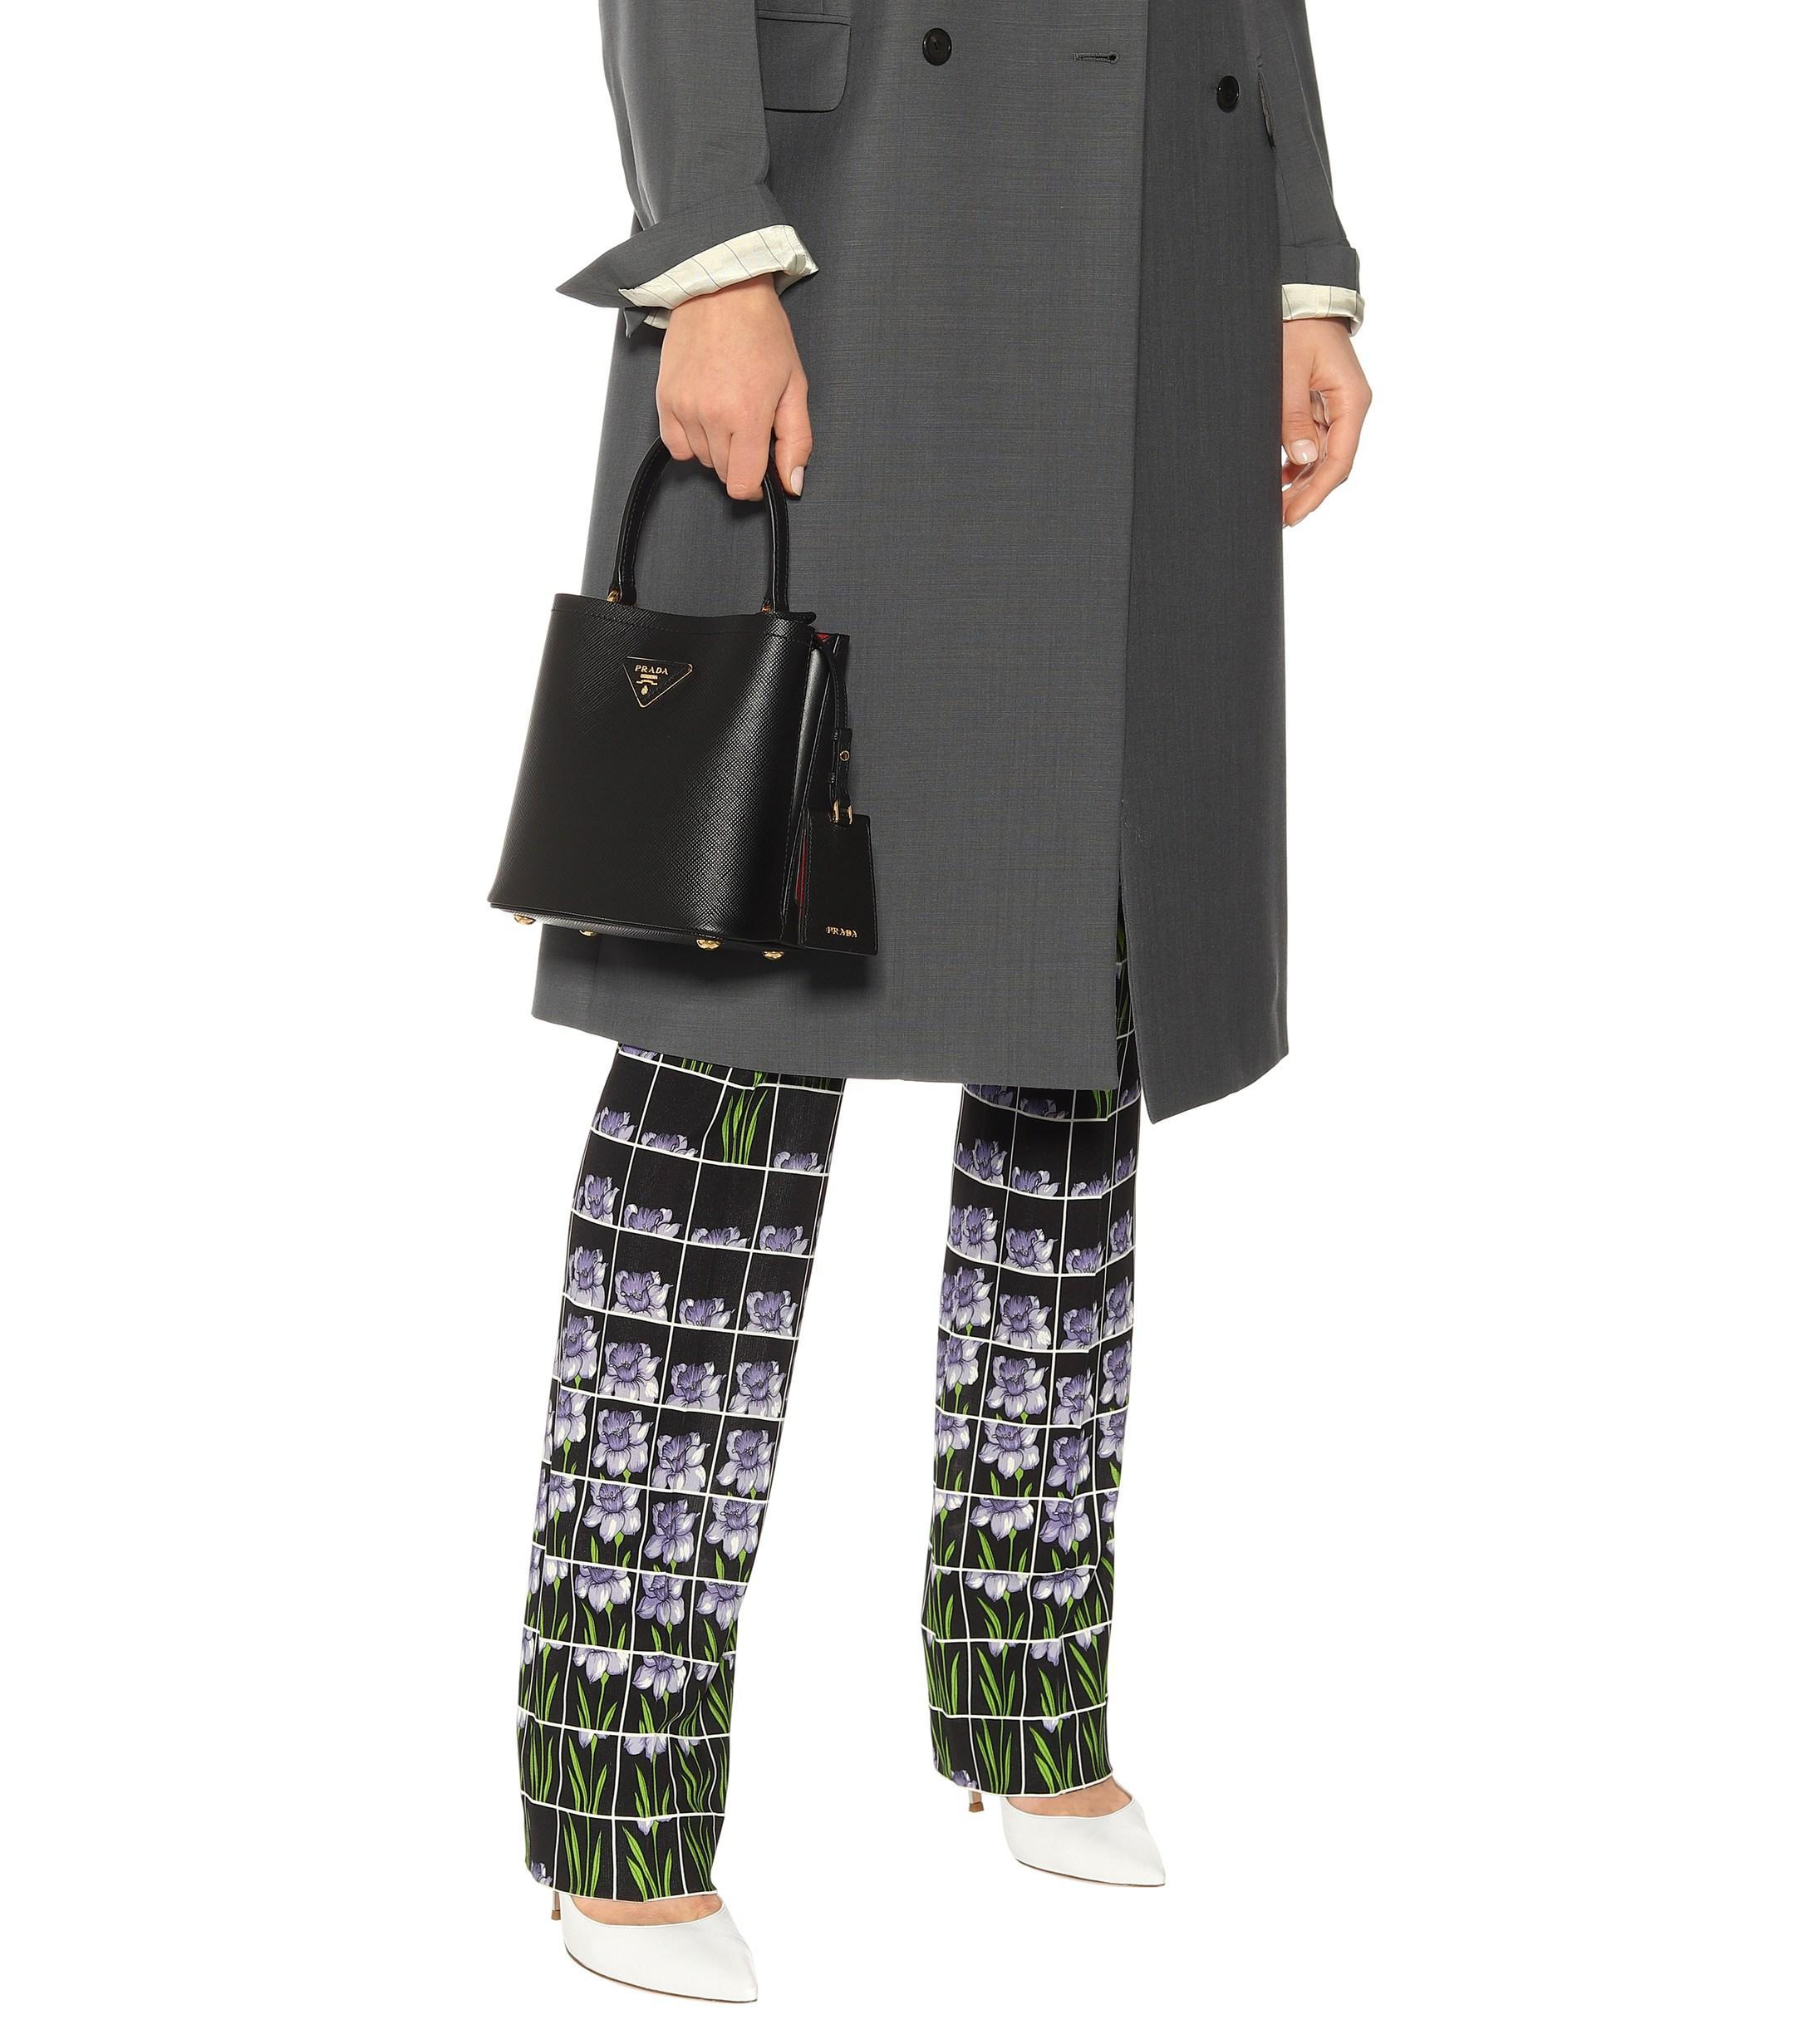 192d325794dd Prada - Black Saffiano Mini Leather Bucket Bag - Lyst. View fullscreen